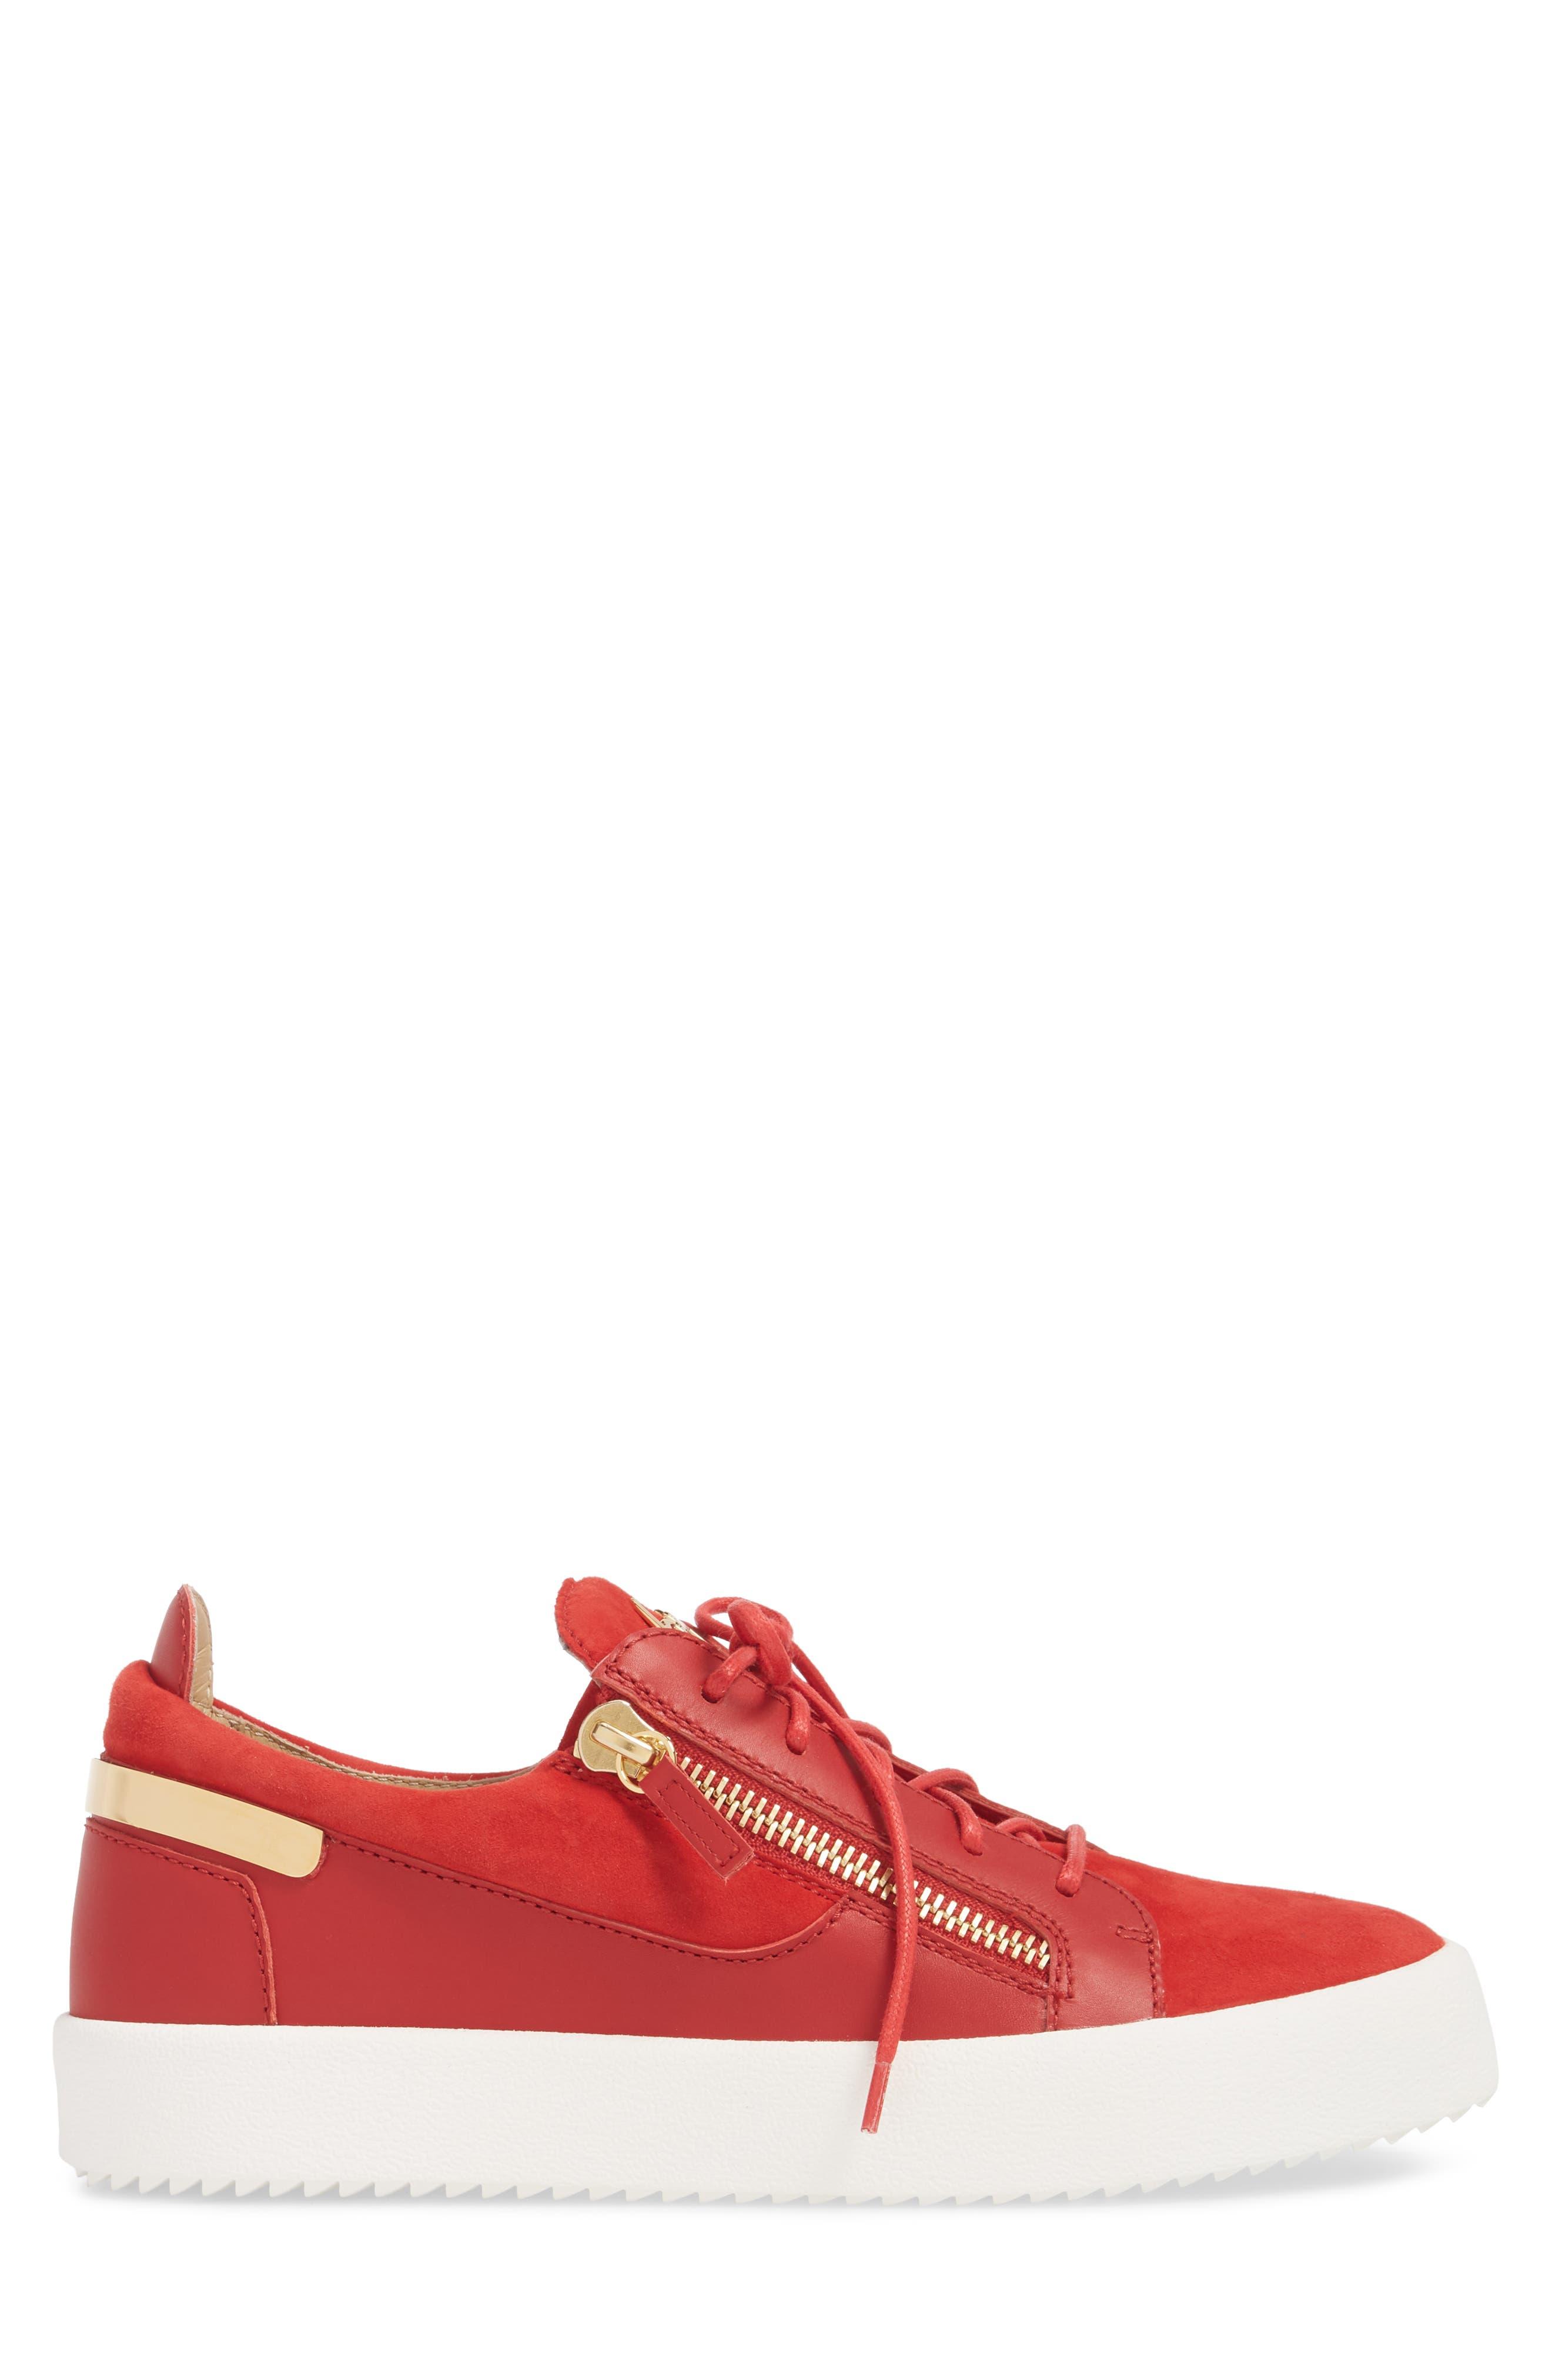 Zip Low Top Sneaker,                             Alternate thumbnail 3, color,                             Fiamma